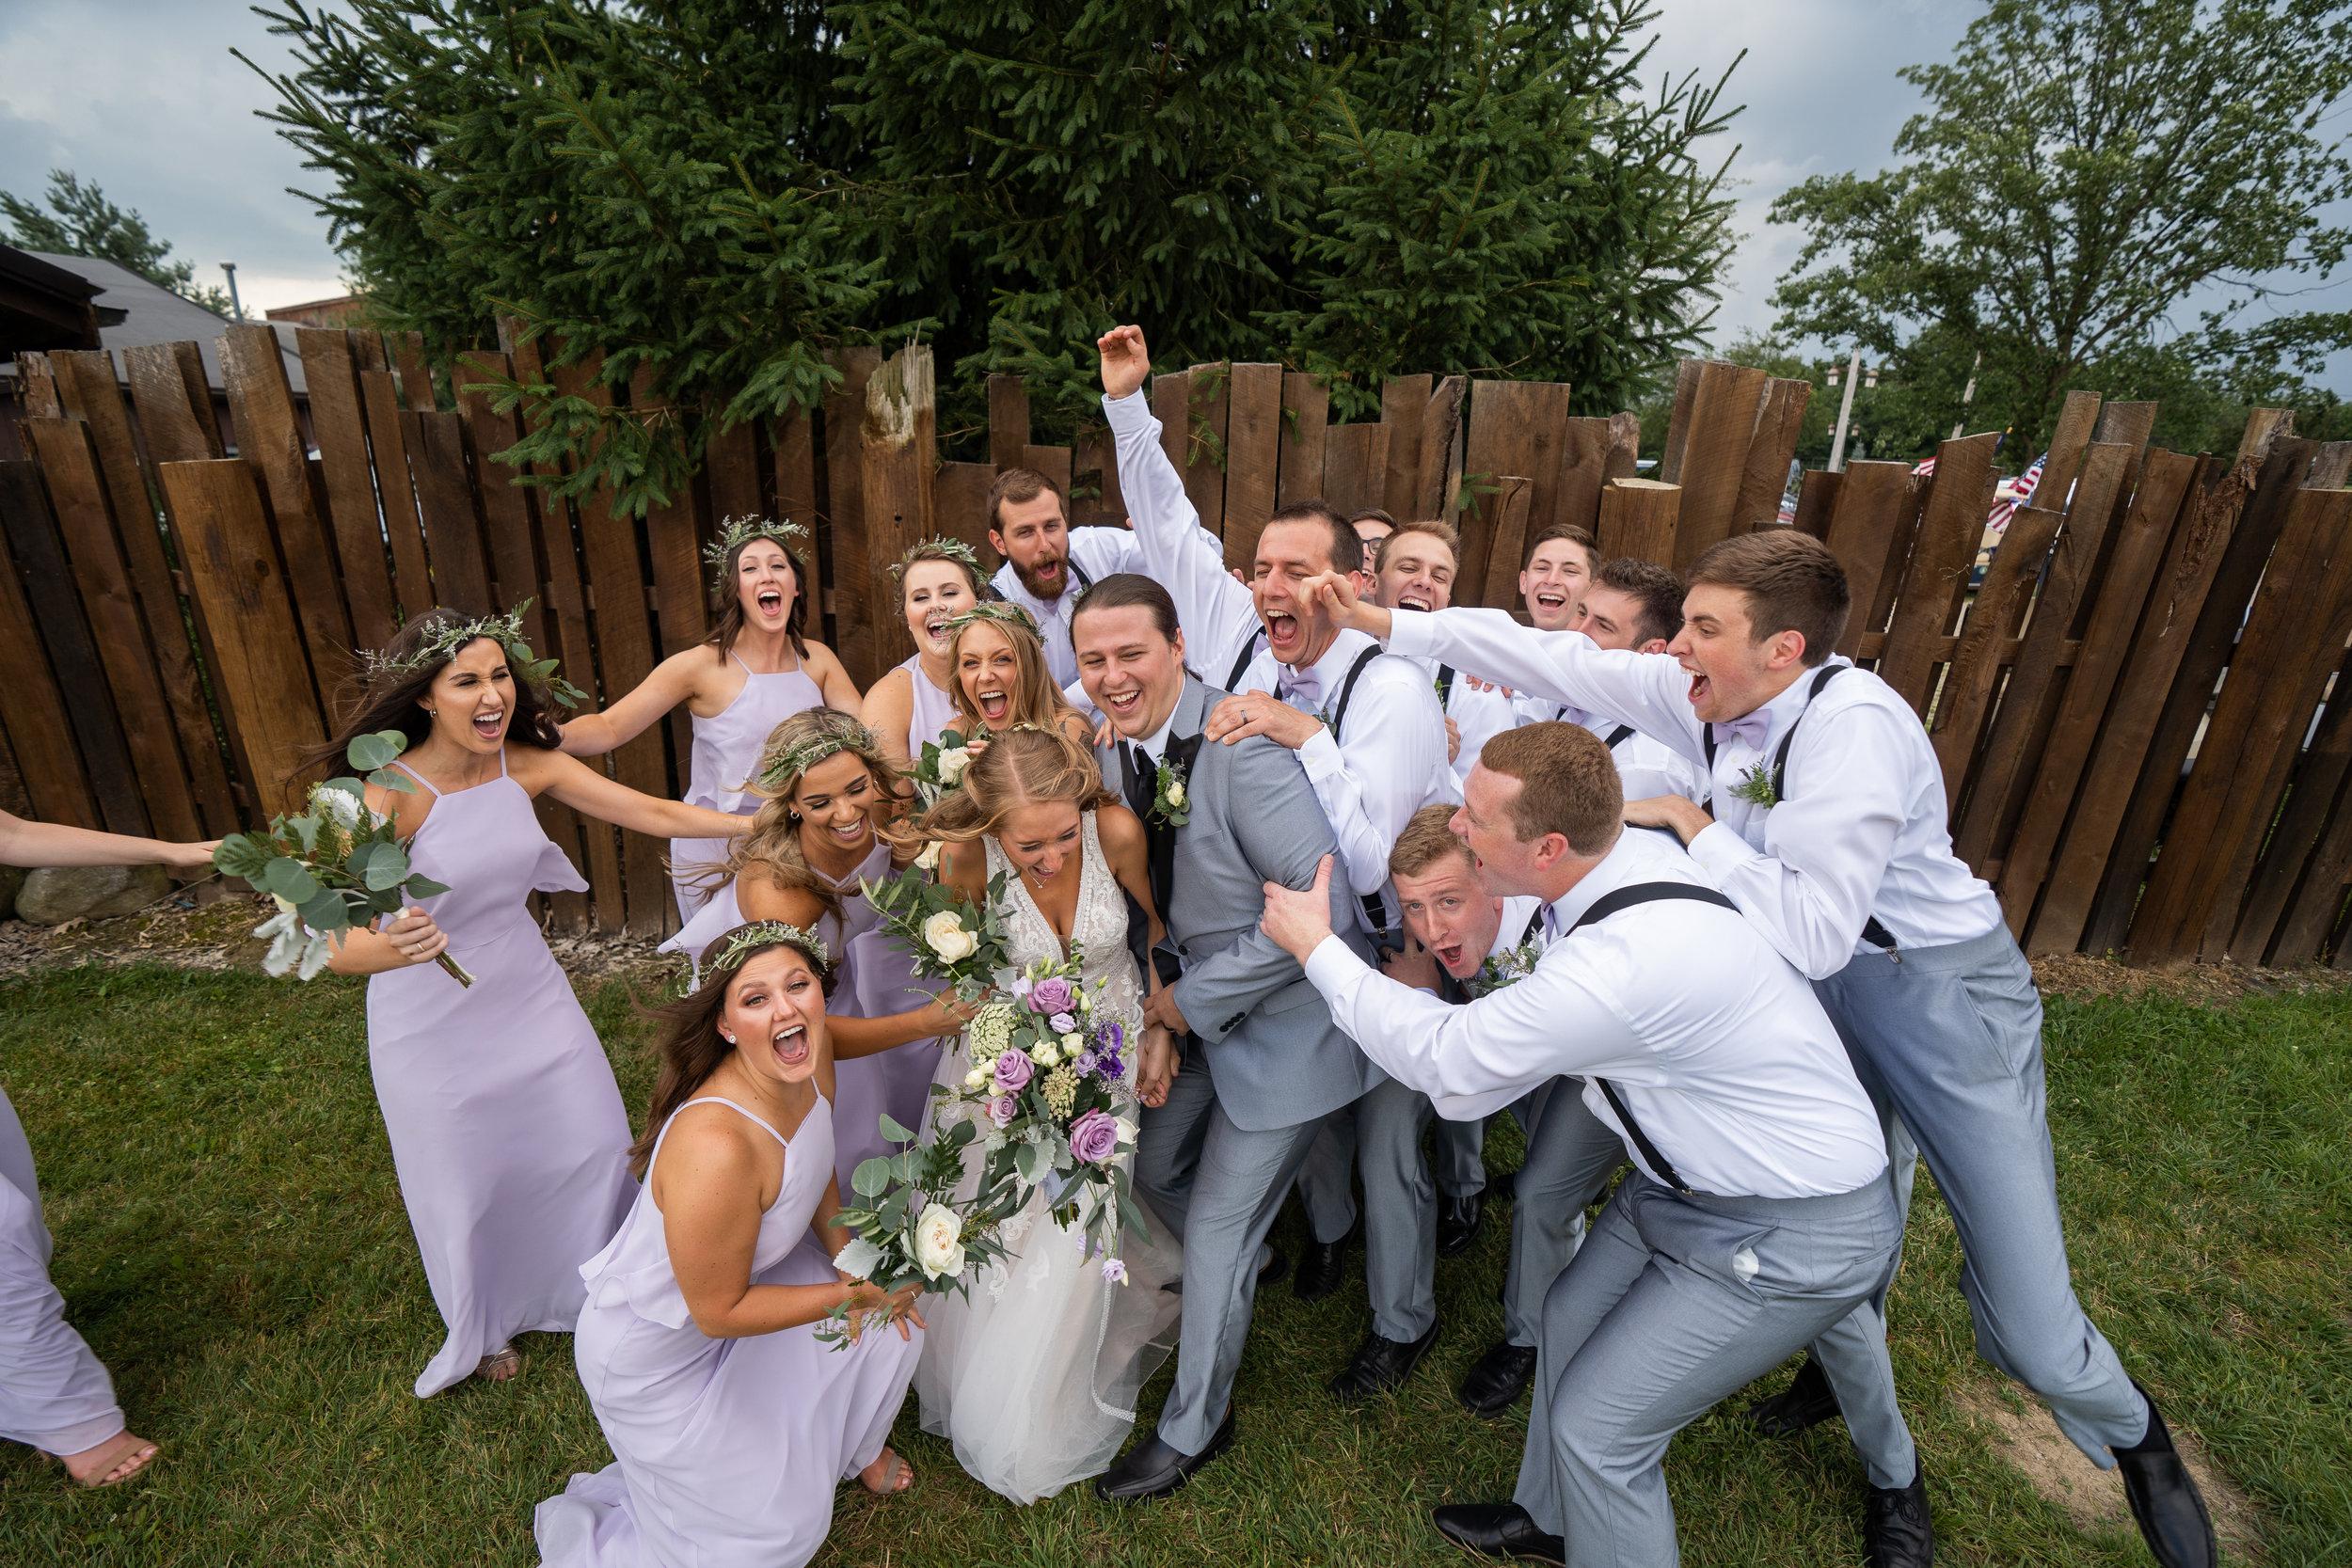 Bear Creative Co, Columbus Ohio Photographer, Columbus Ohio Wedding Photographer, Autumn Lakes, Campground Wedding, Sunbury OH, Columbus Ohio, Destination Photographer